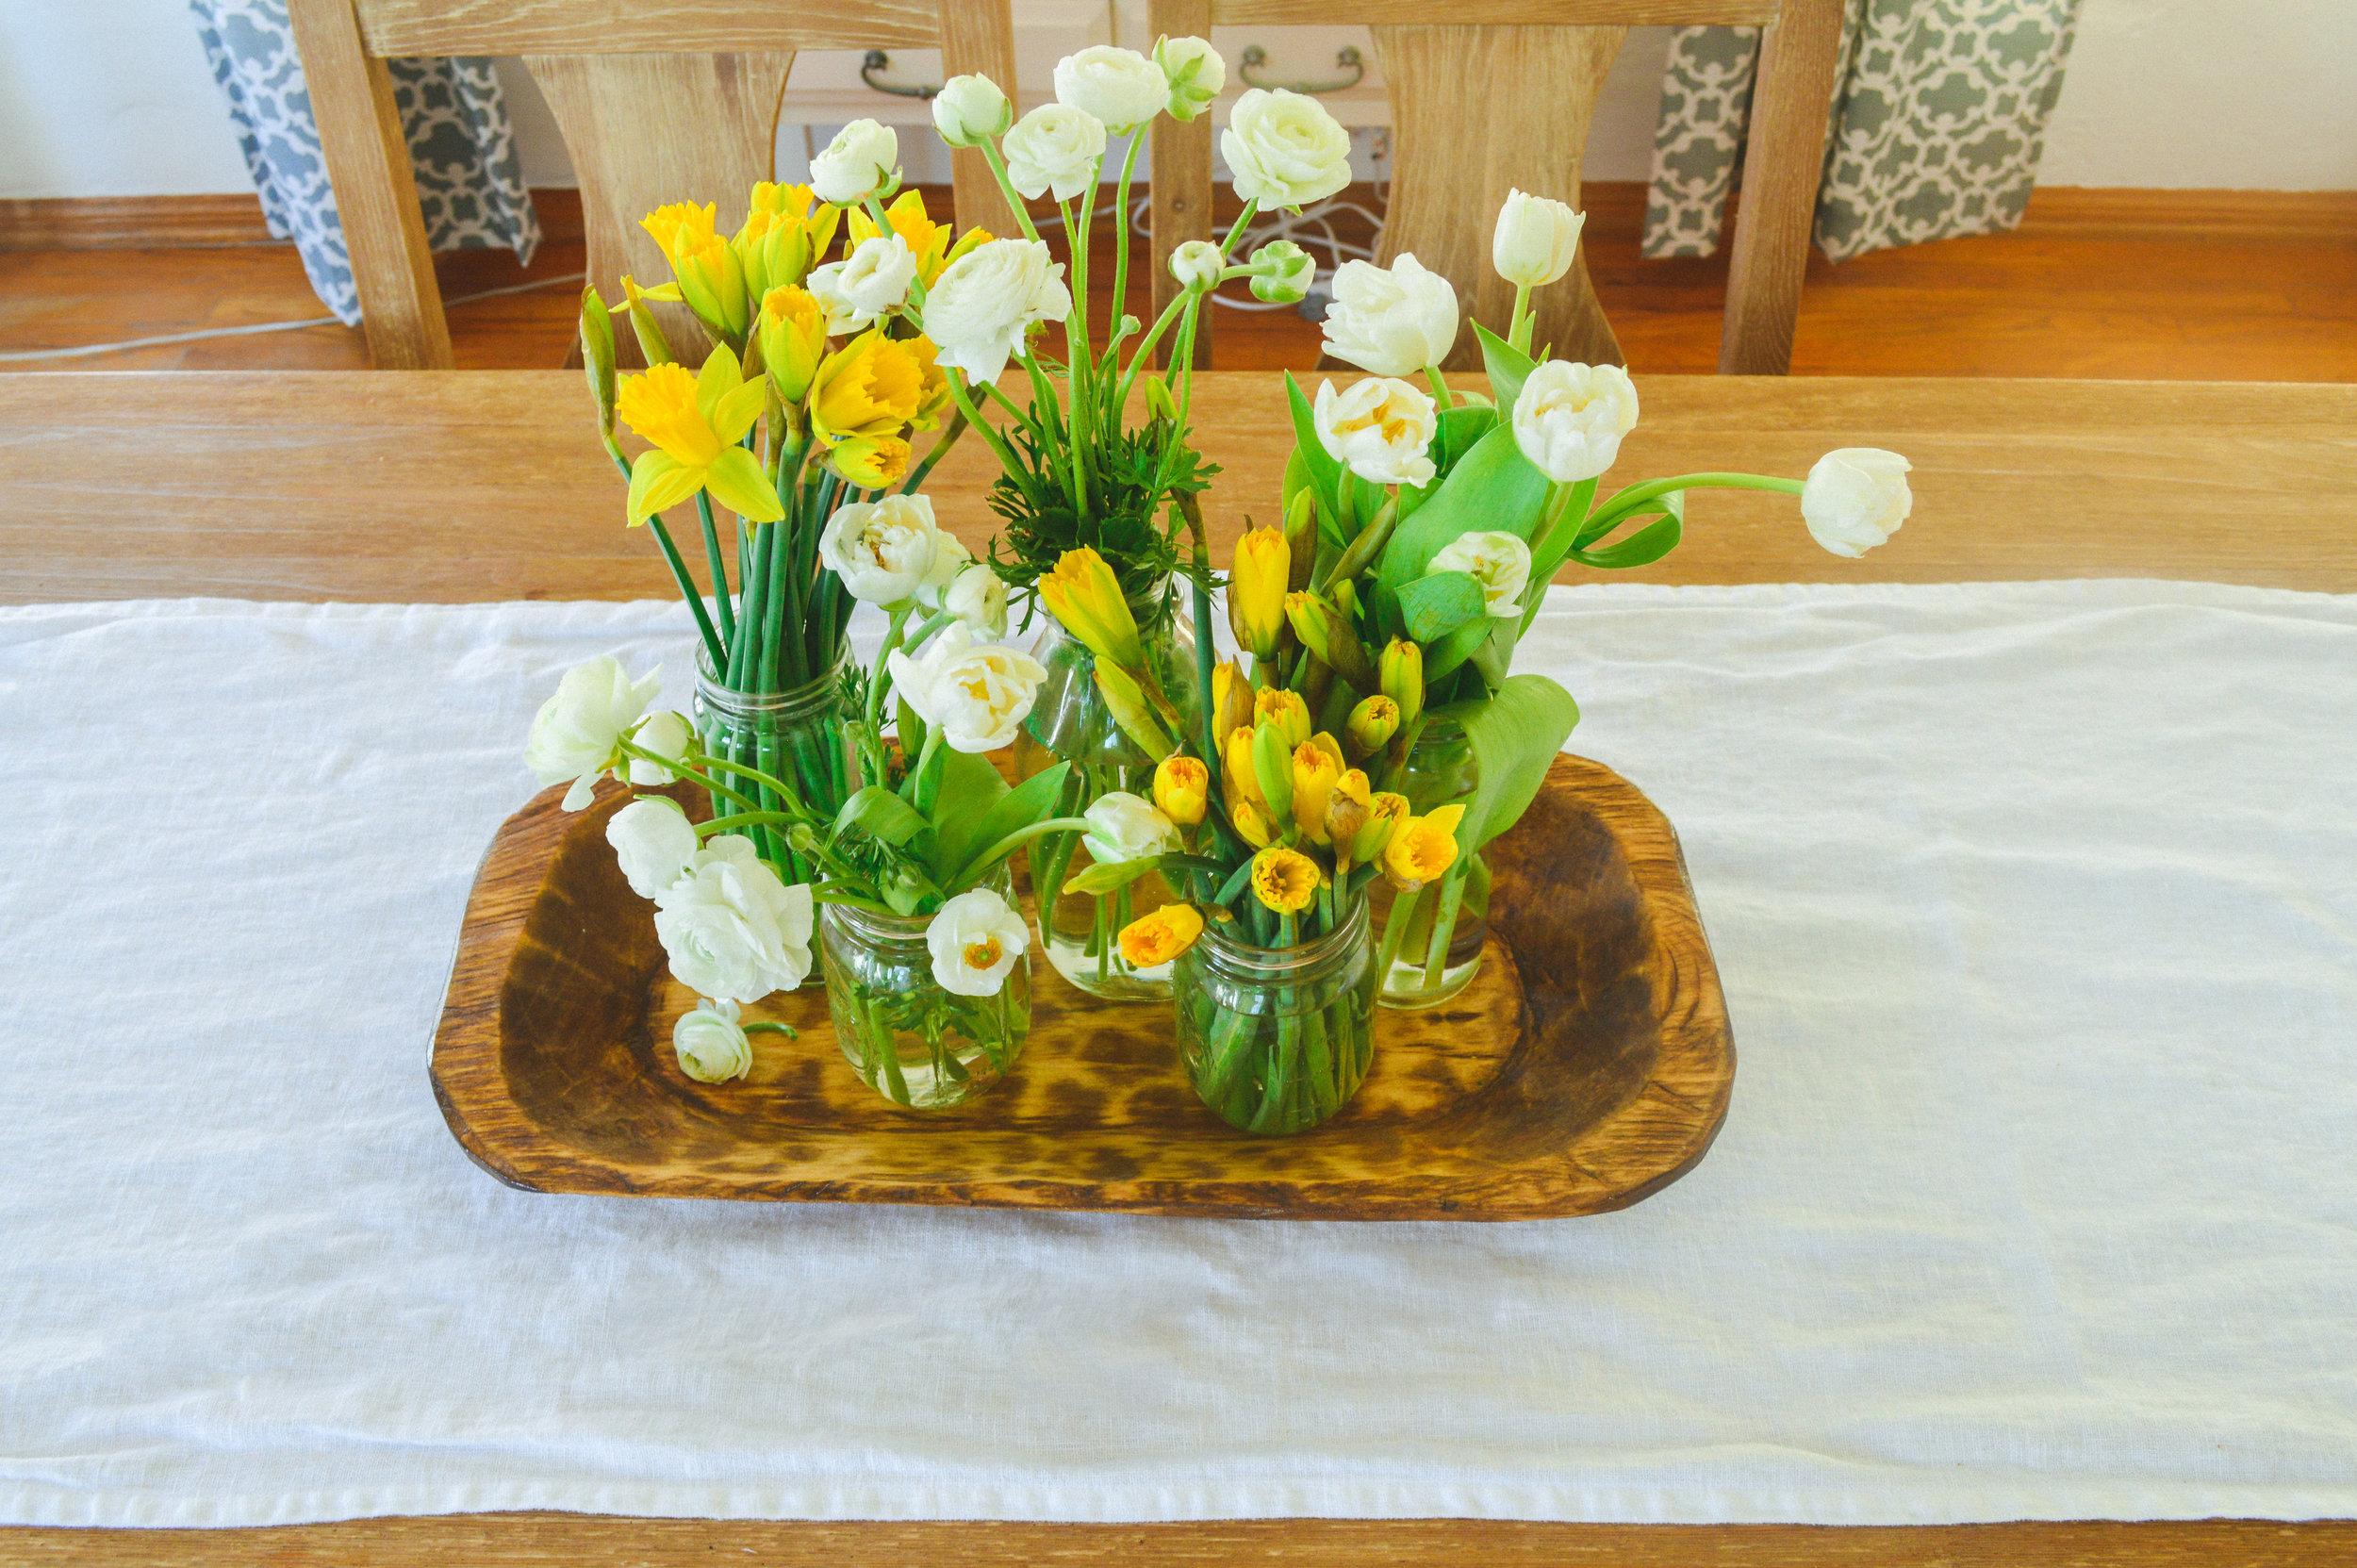 Easter Pics-Easter Pics-0005.jpg